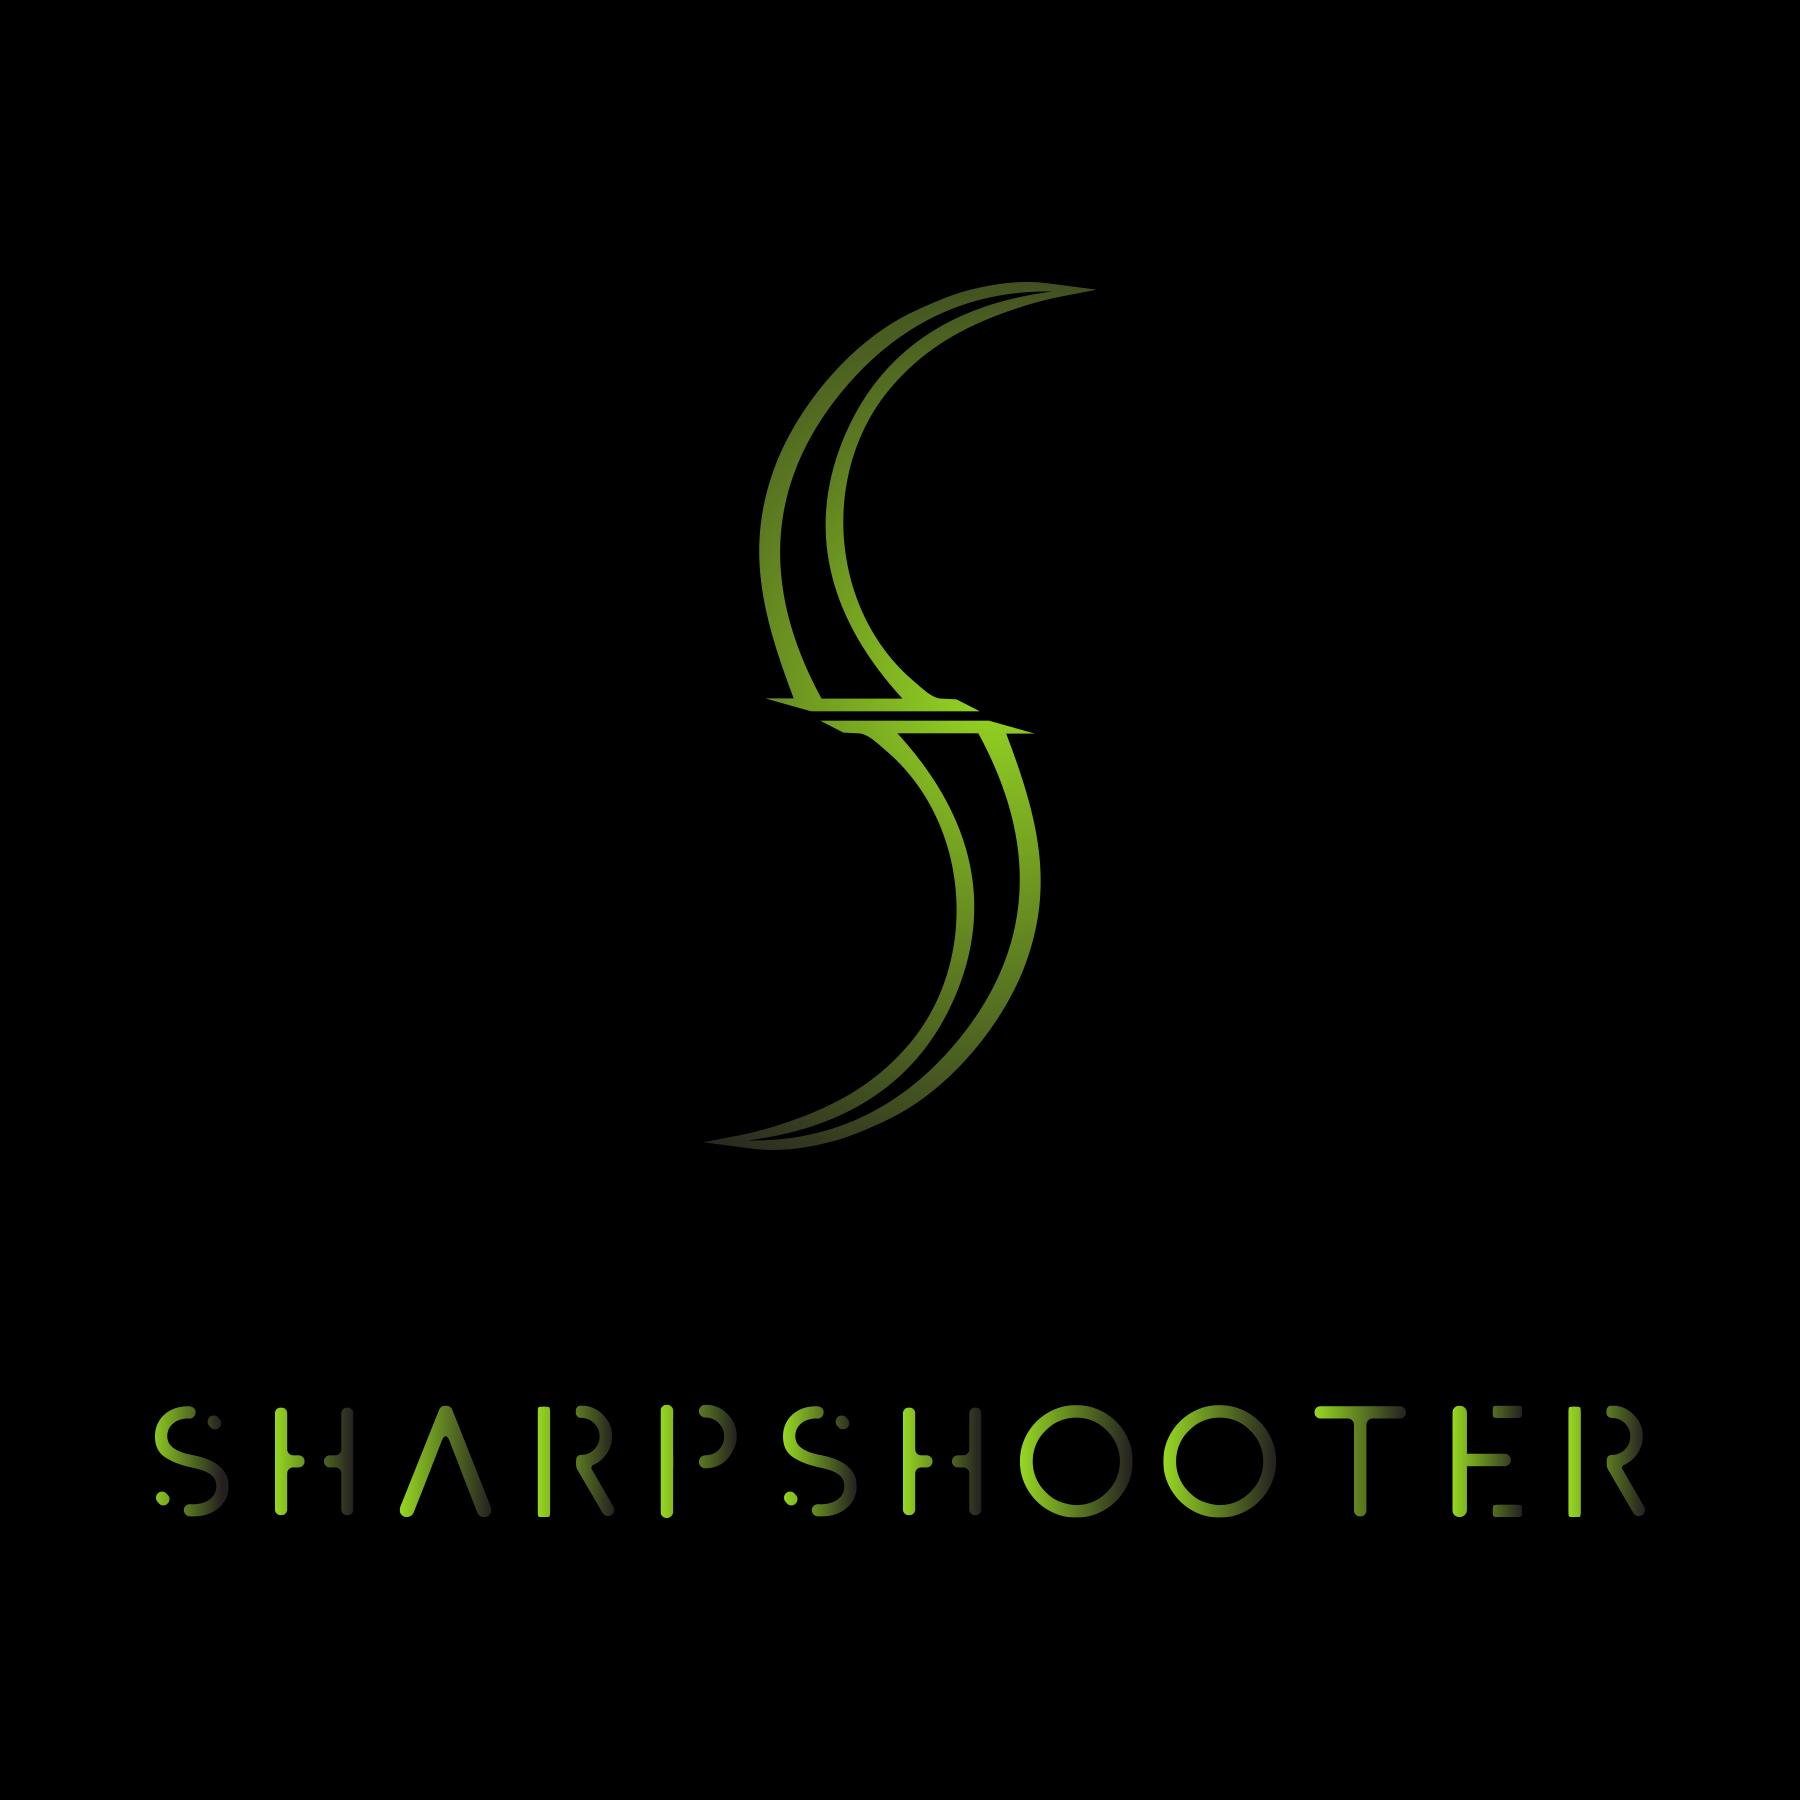 Sharpsh00ter